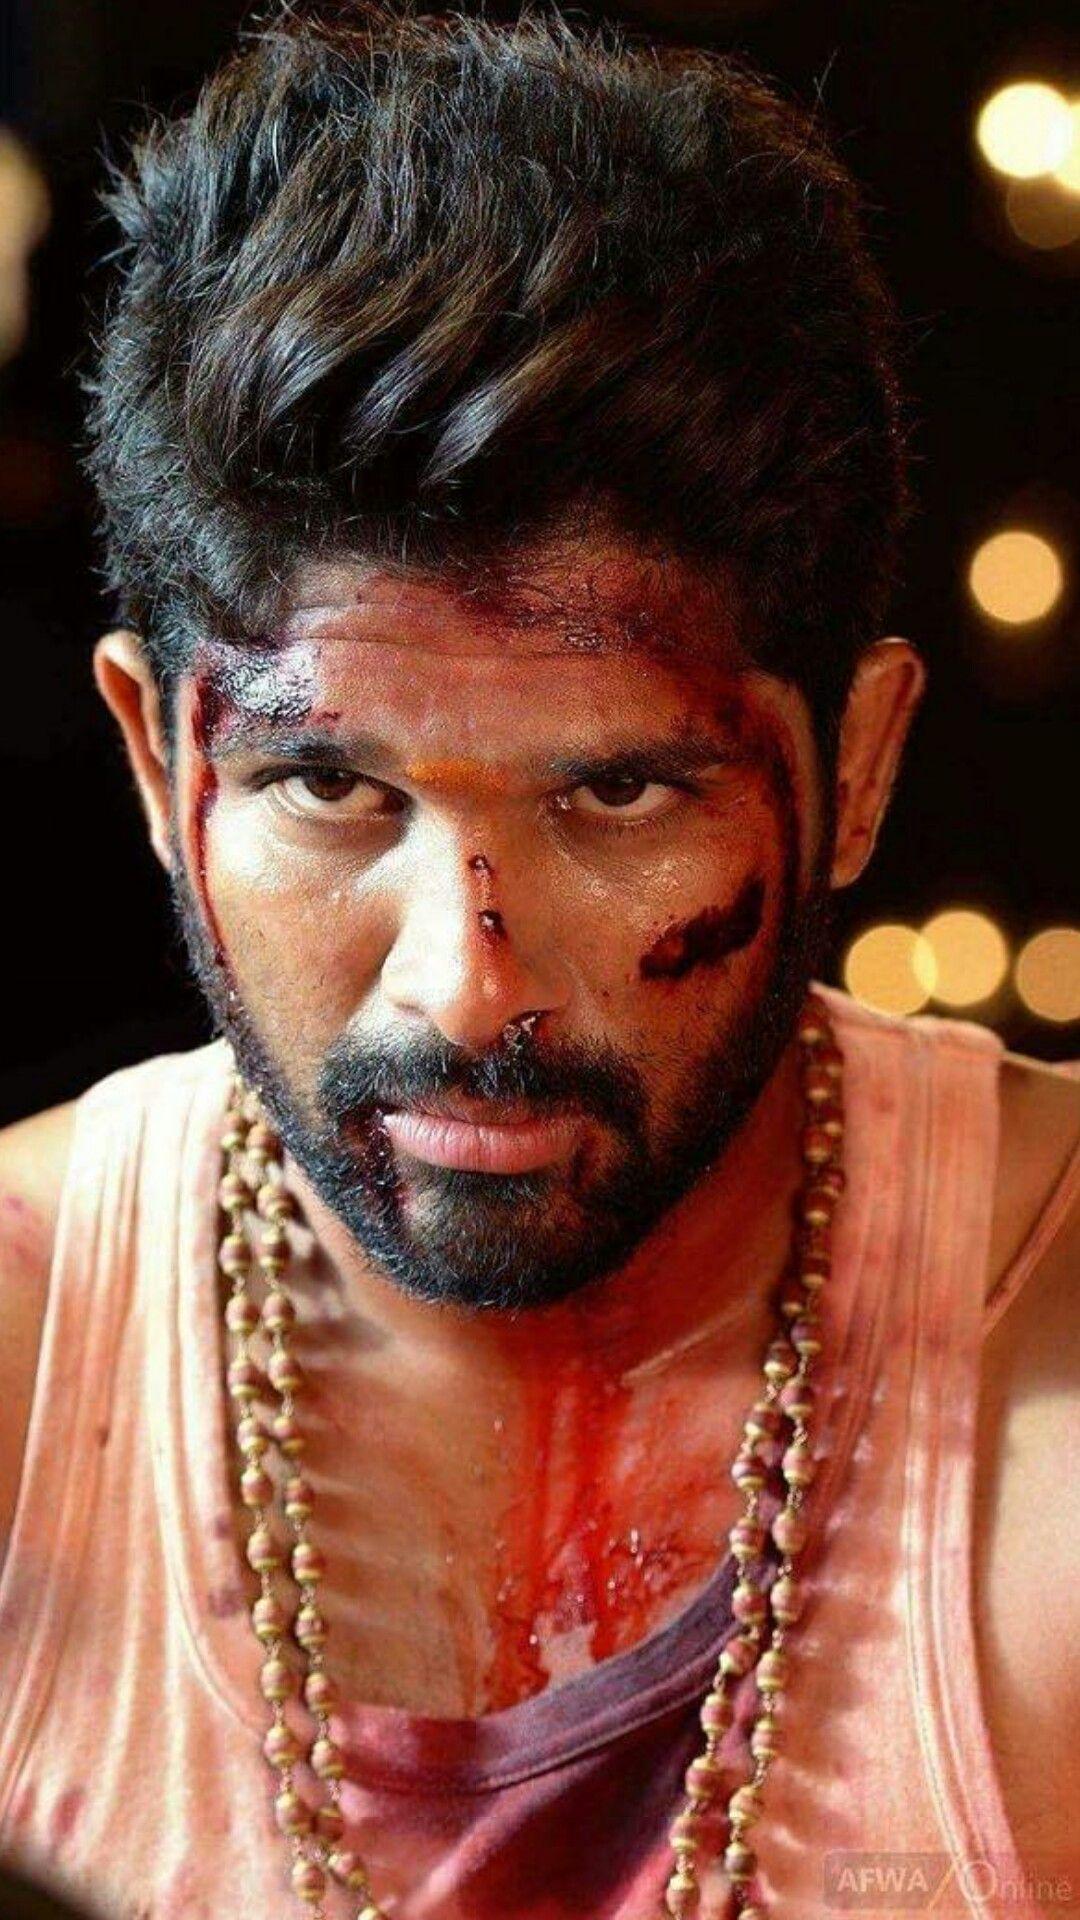 Pin By Chandu On Allu Arjun Allu Arjun Hairstyle Telugu Hero Remix Music